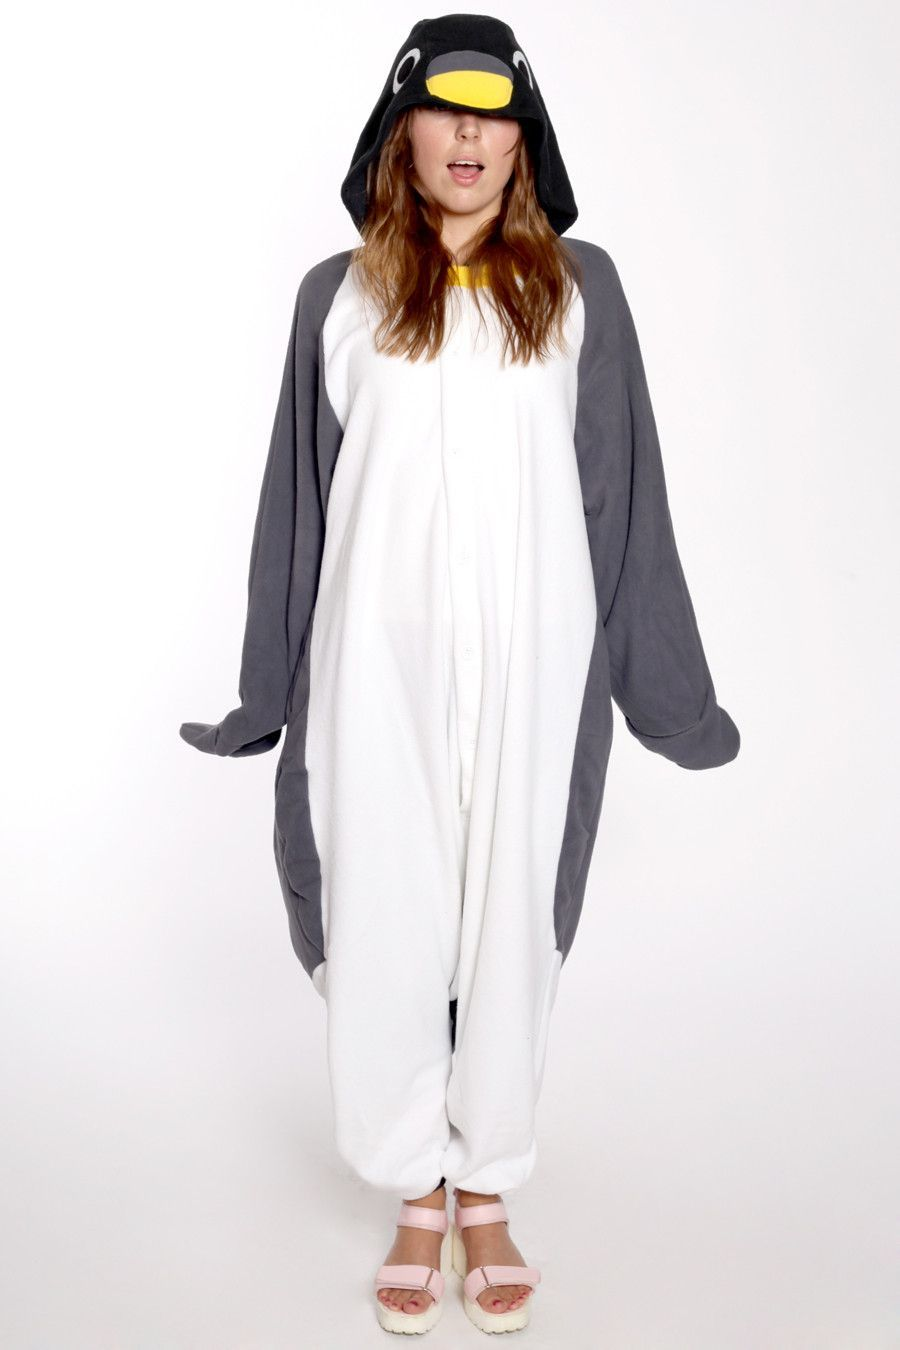 Penguin Adult Onesie Pajamas Adult Pajamas Penguin Costume